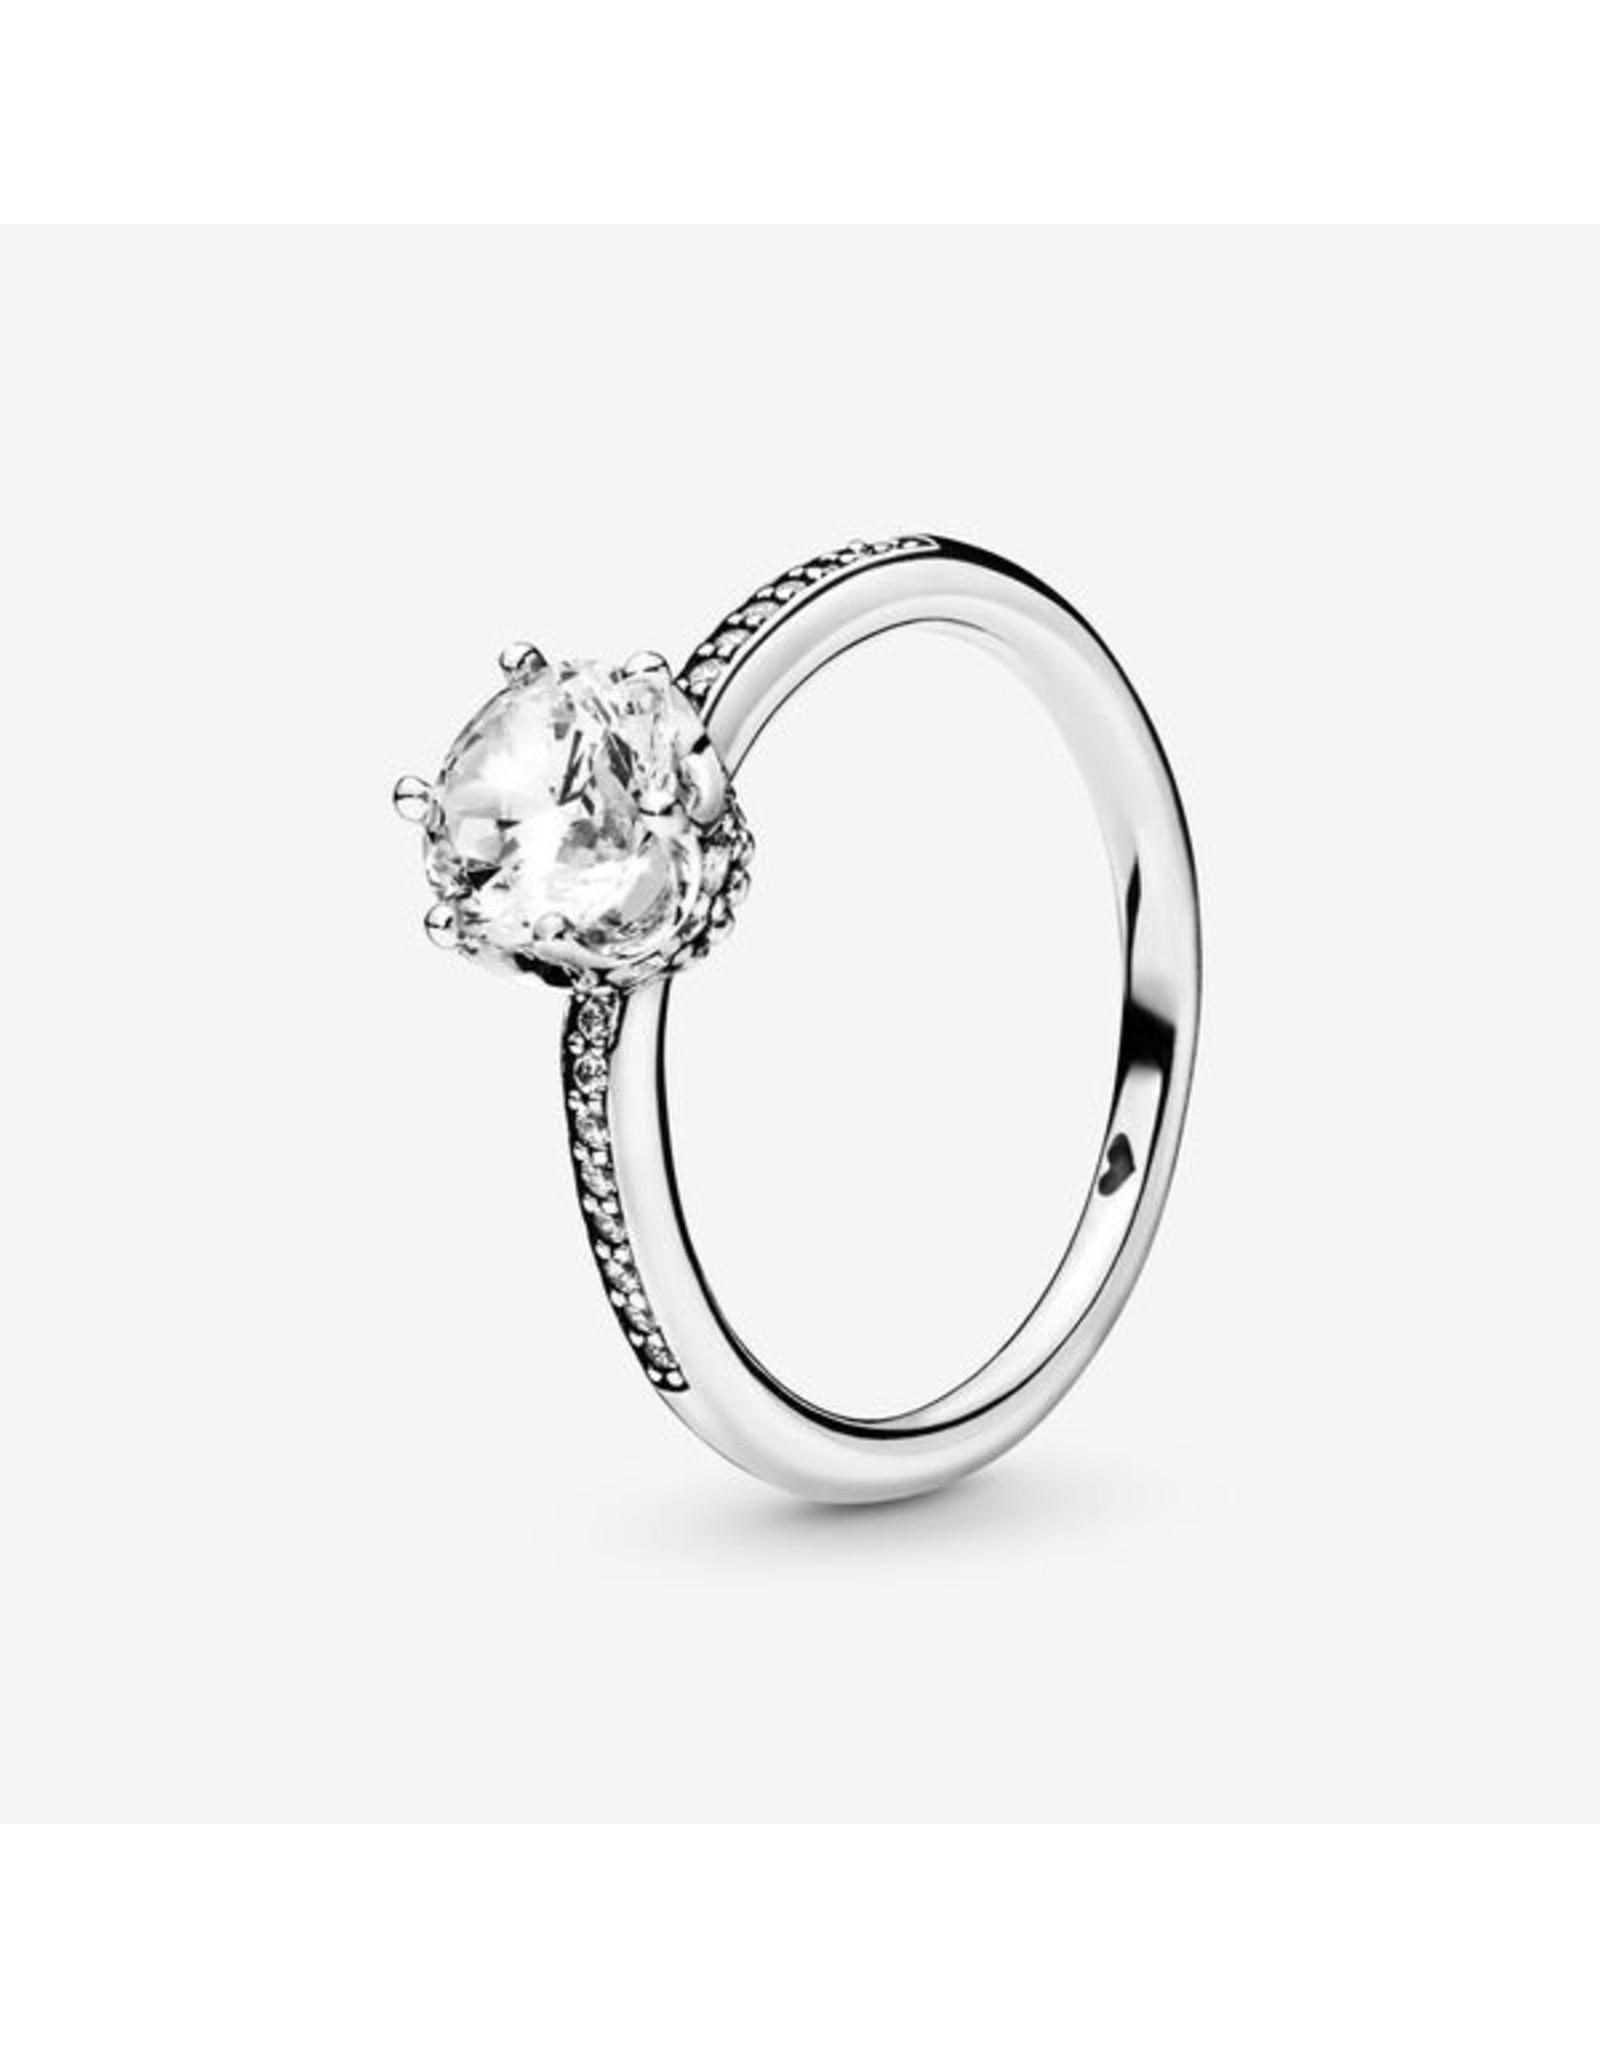 Pandora Pandora Ring, (198289CZ) Sparkling Crown, Clear CZ